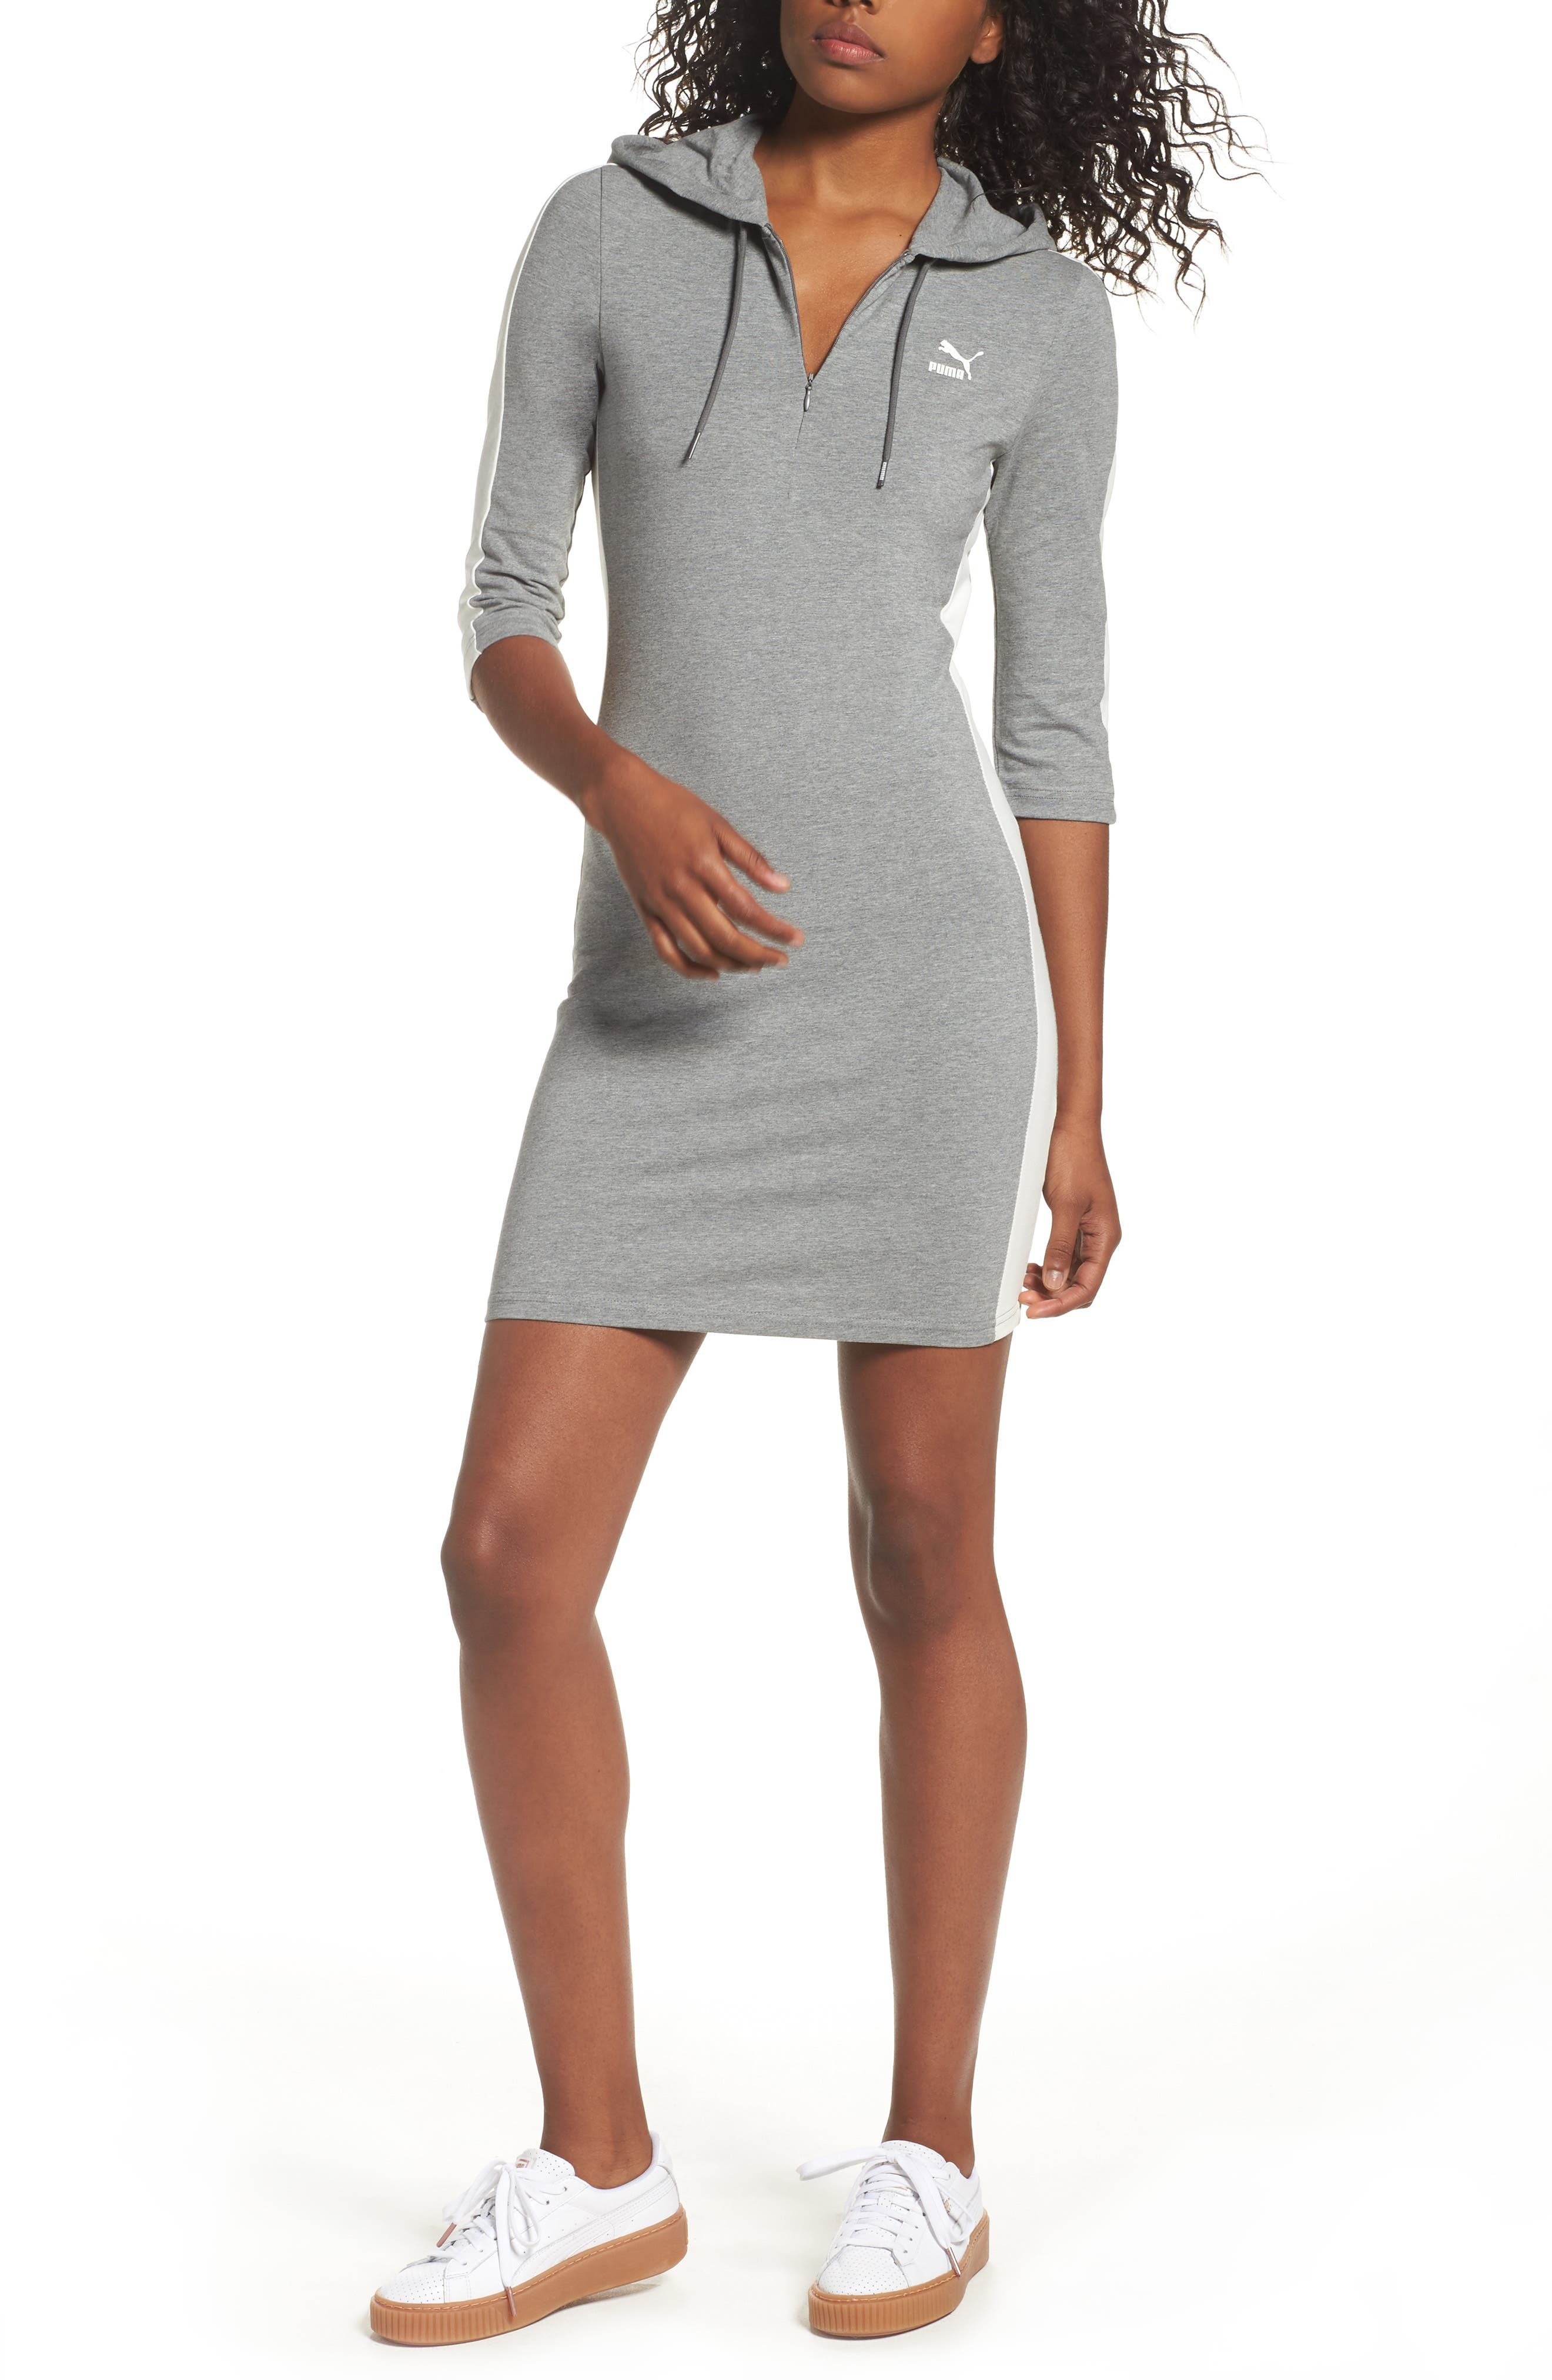 fdf6131726ac puma ladies clothing on sale   OFF78% Discounts